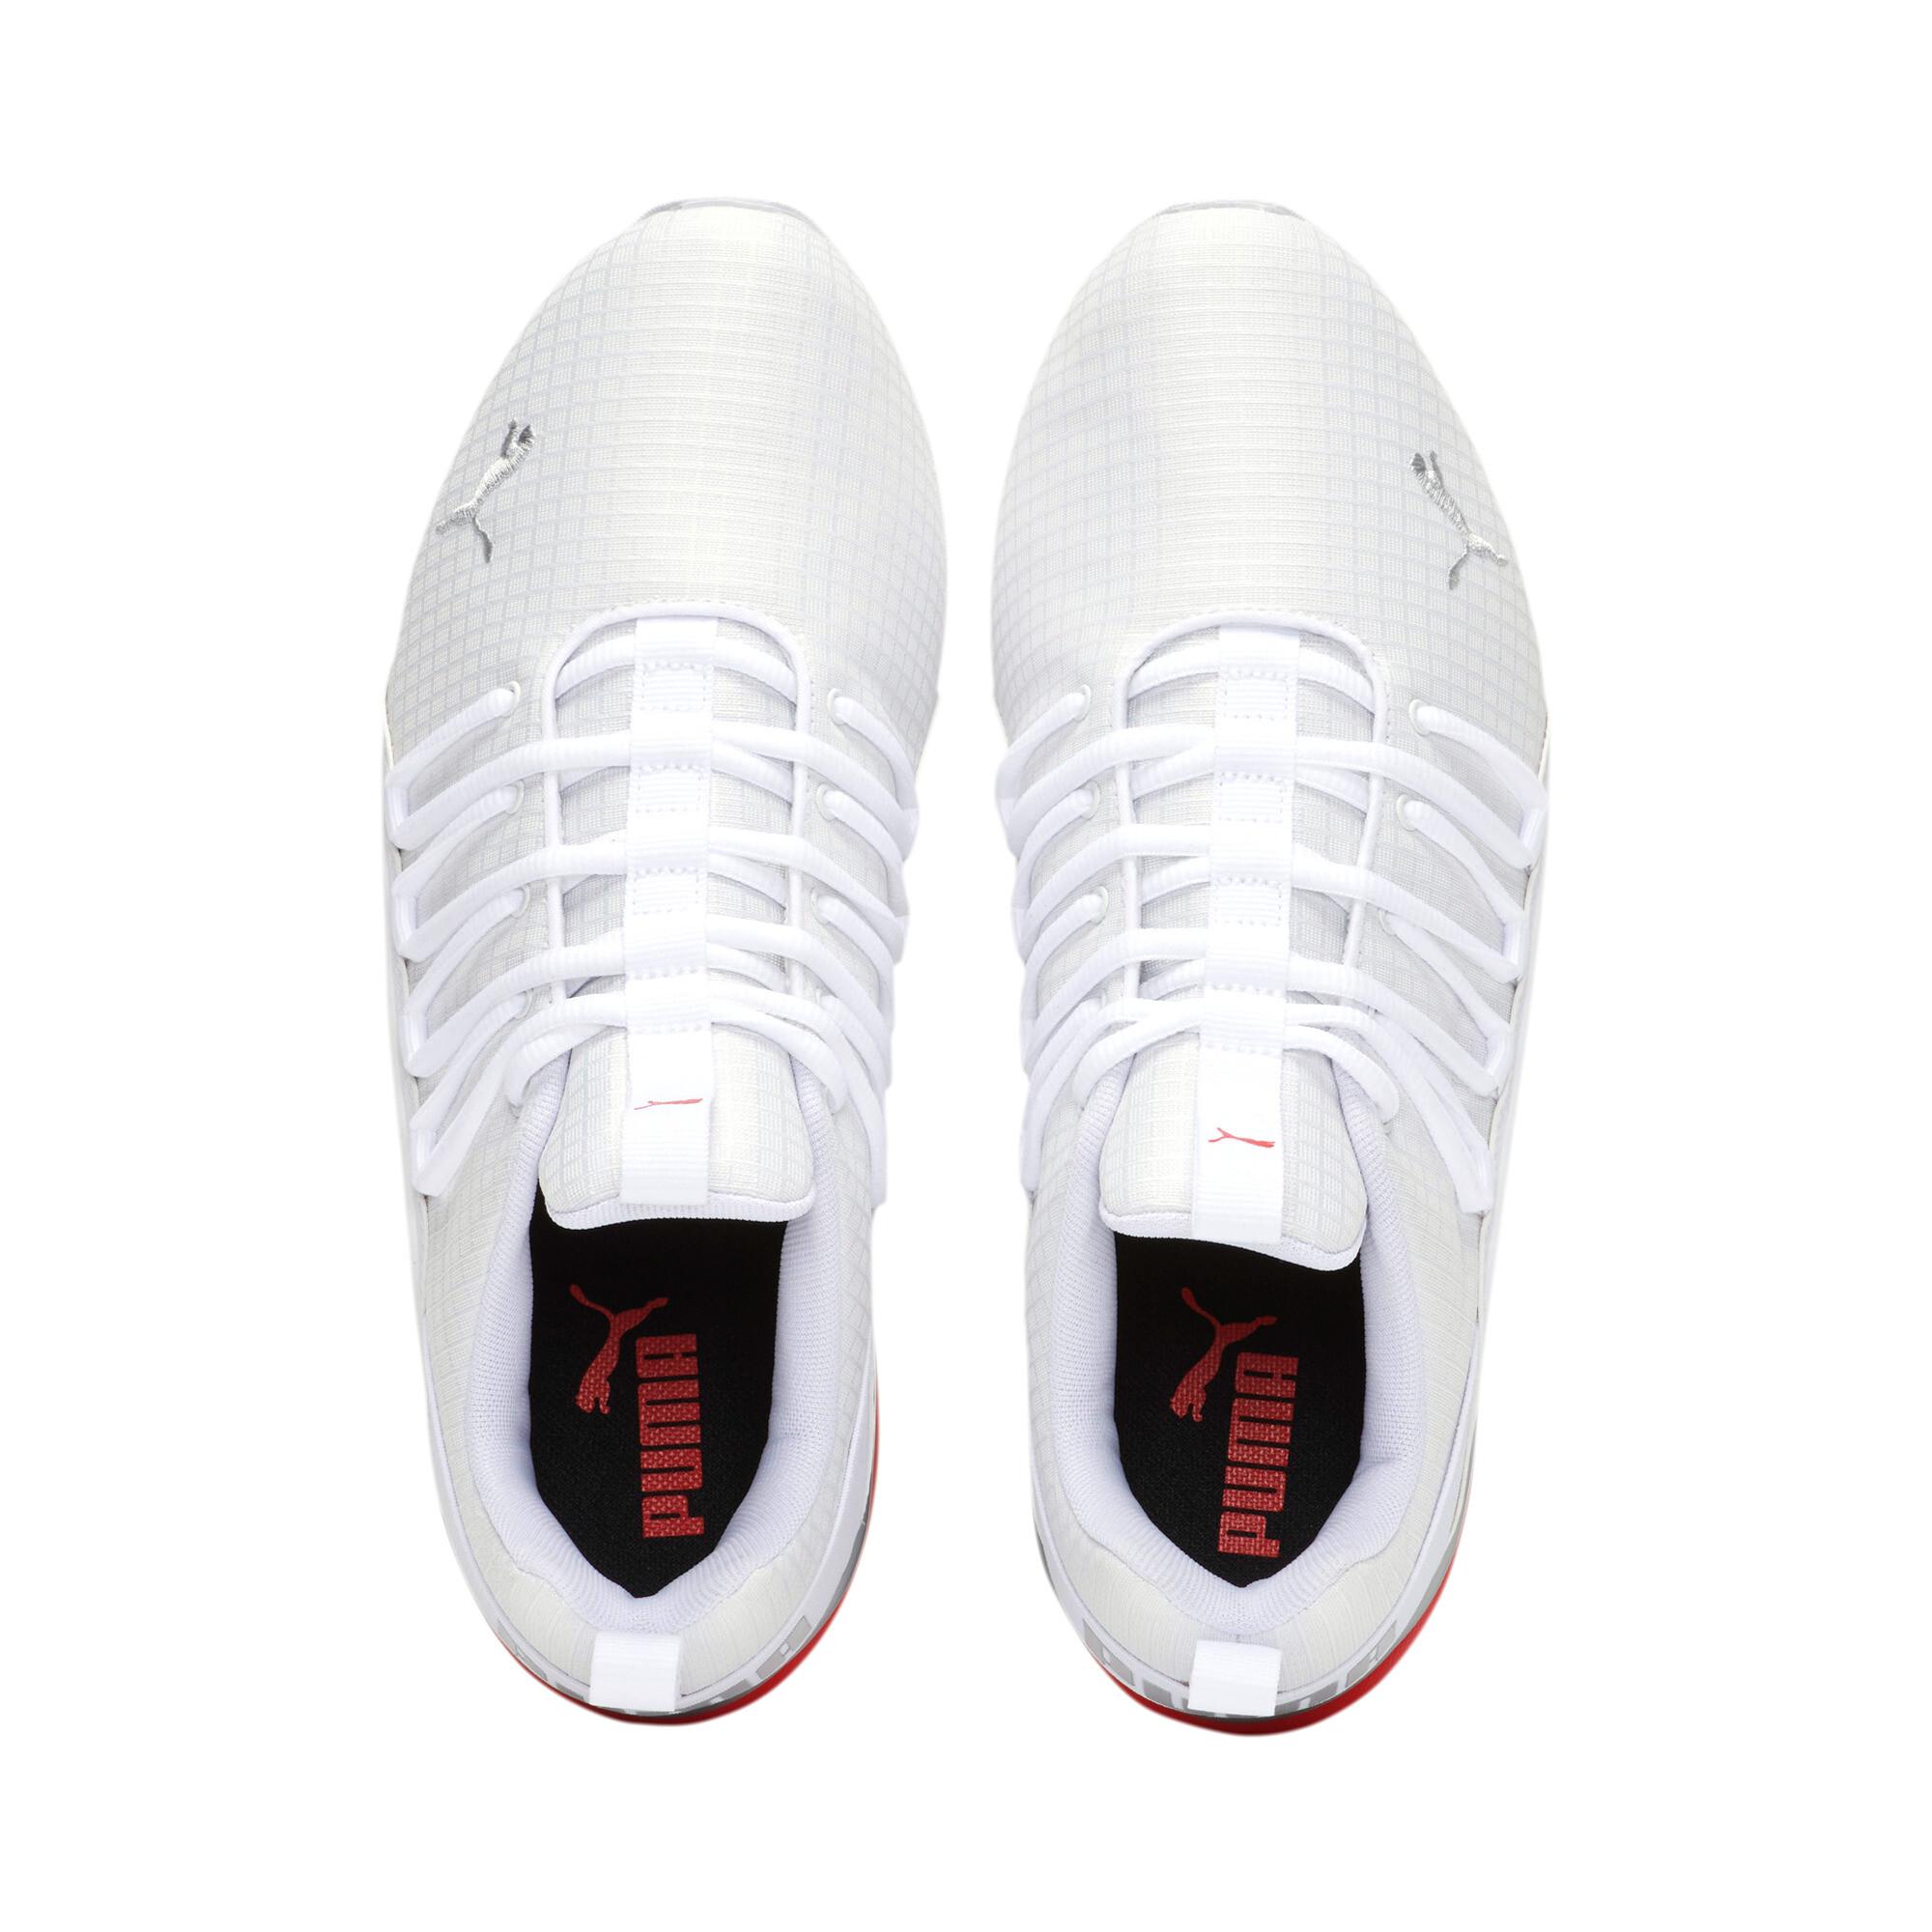 PUMA-Men-039-s-Momenta-Ripstop-Training-Shoes thumbnail 7